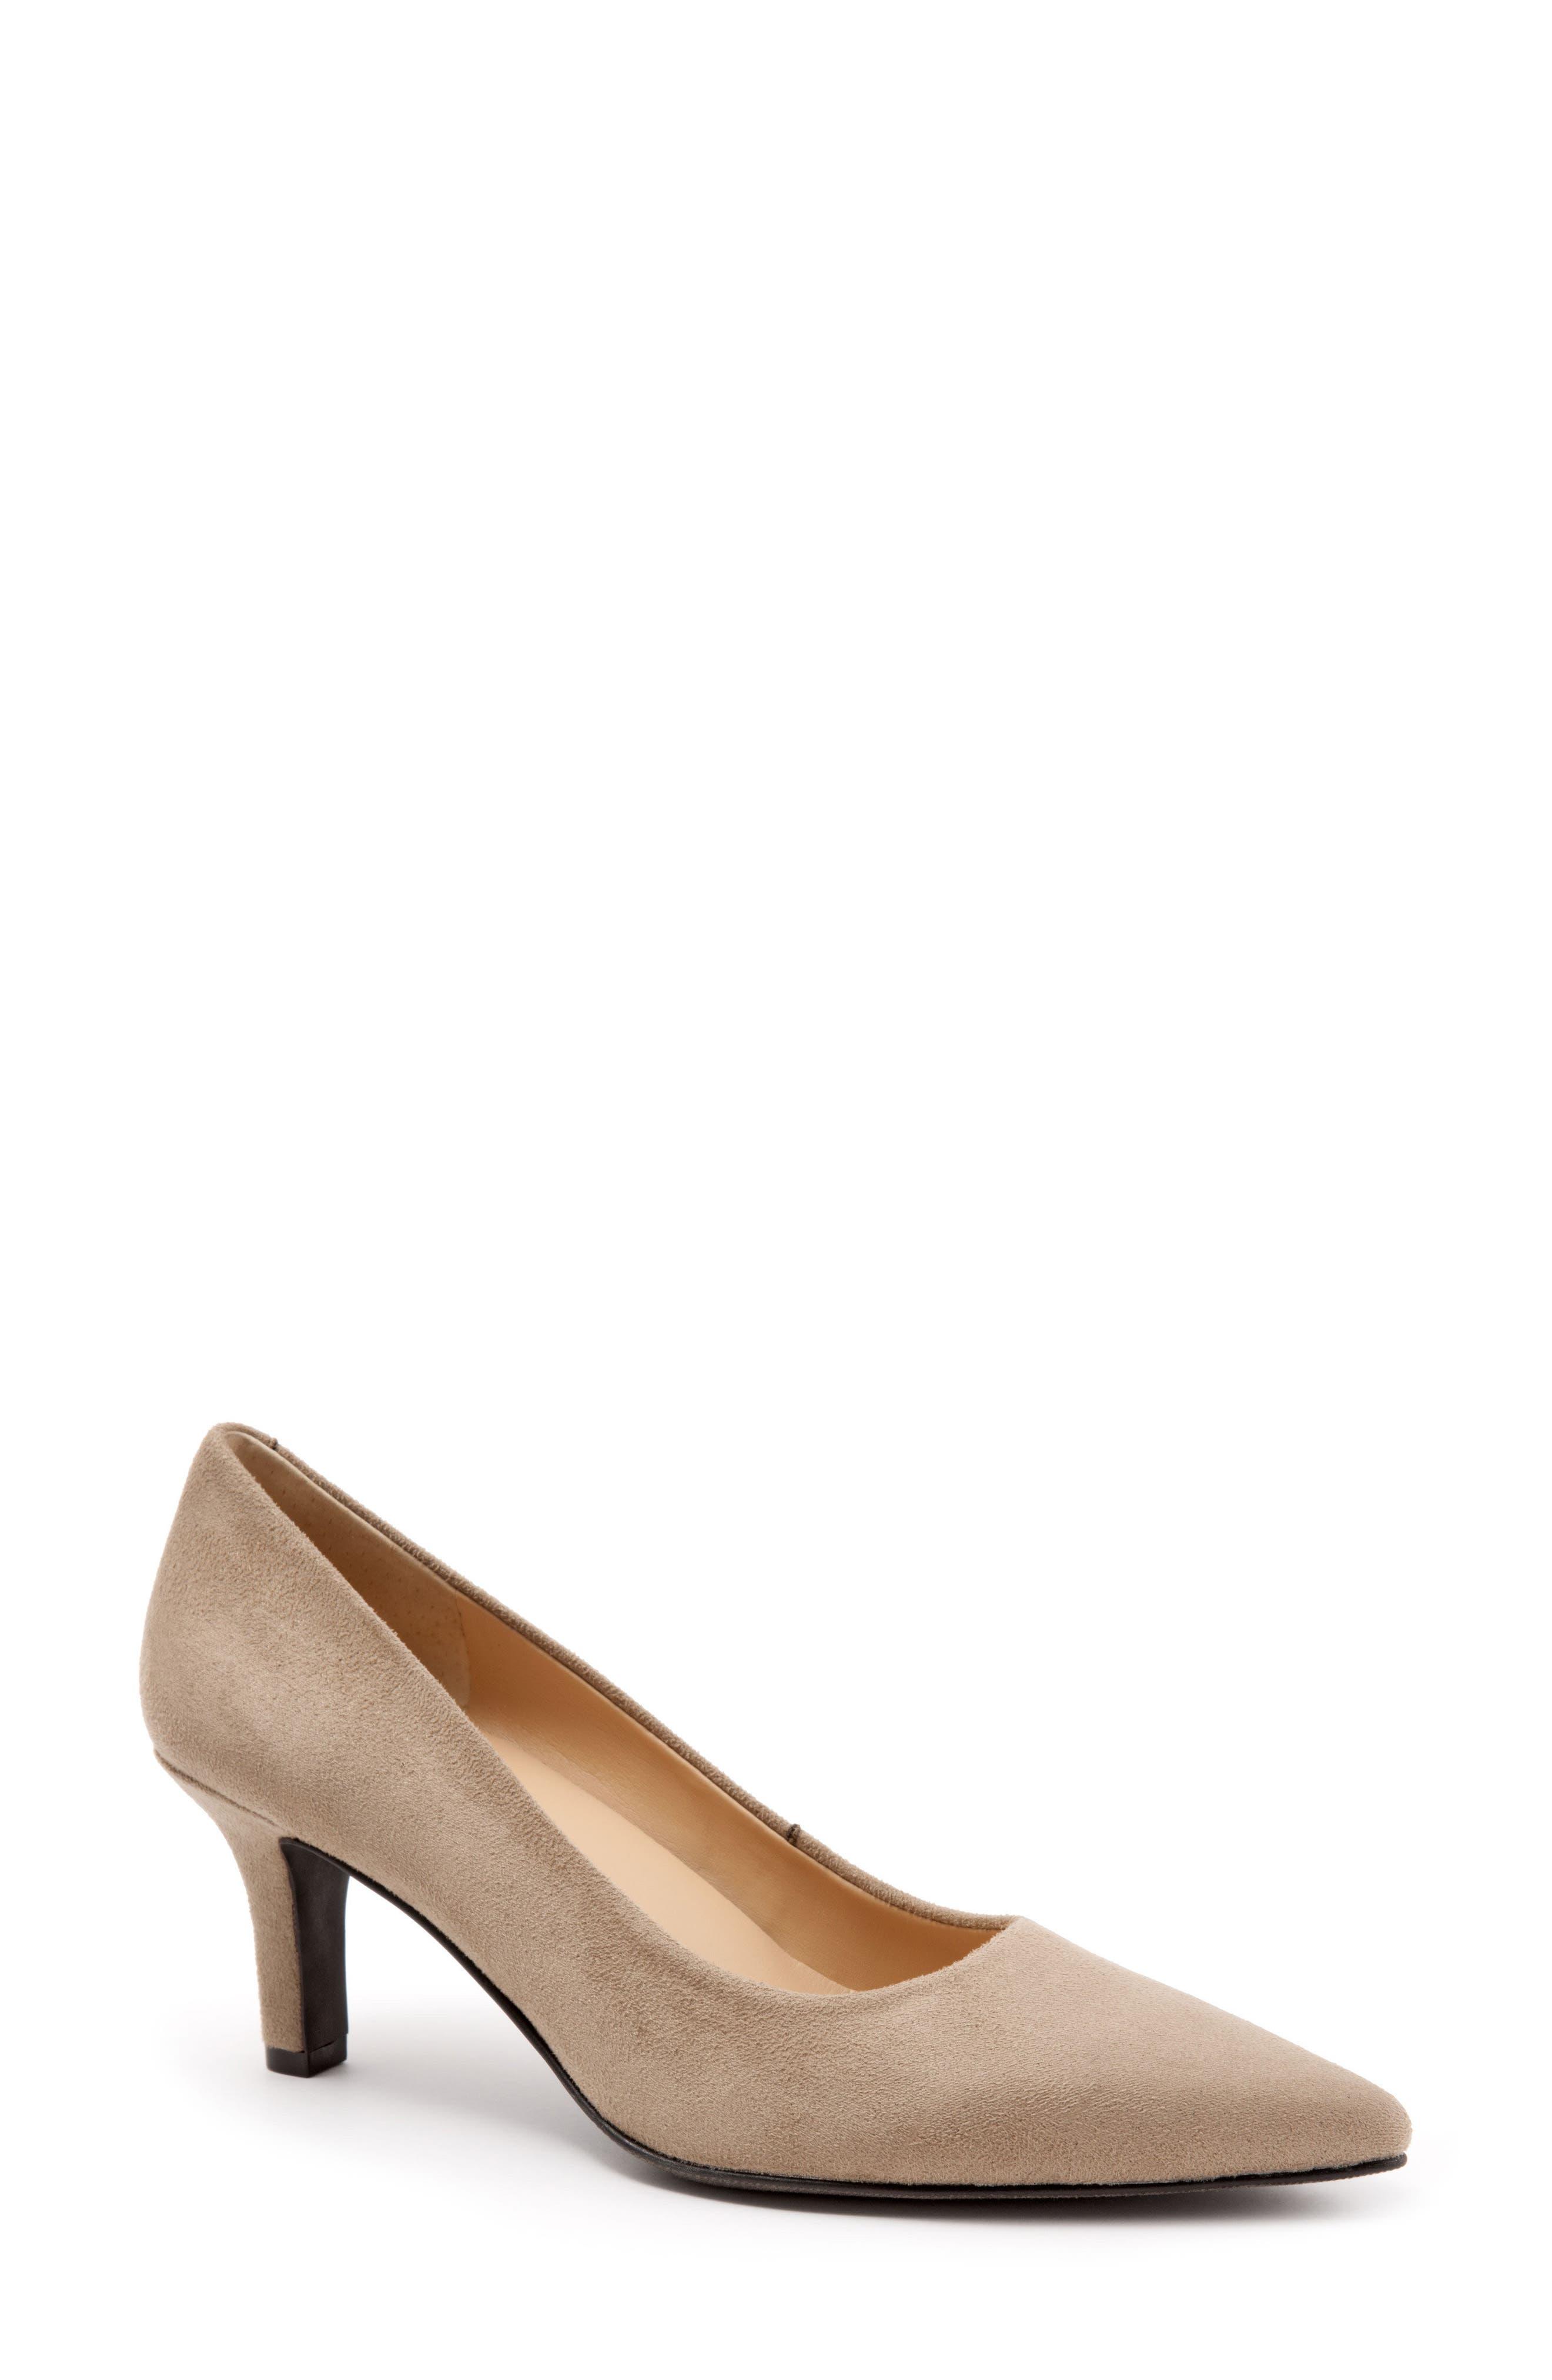 Woven Women's Shoes Brands